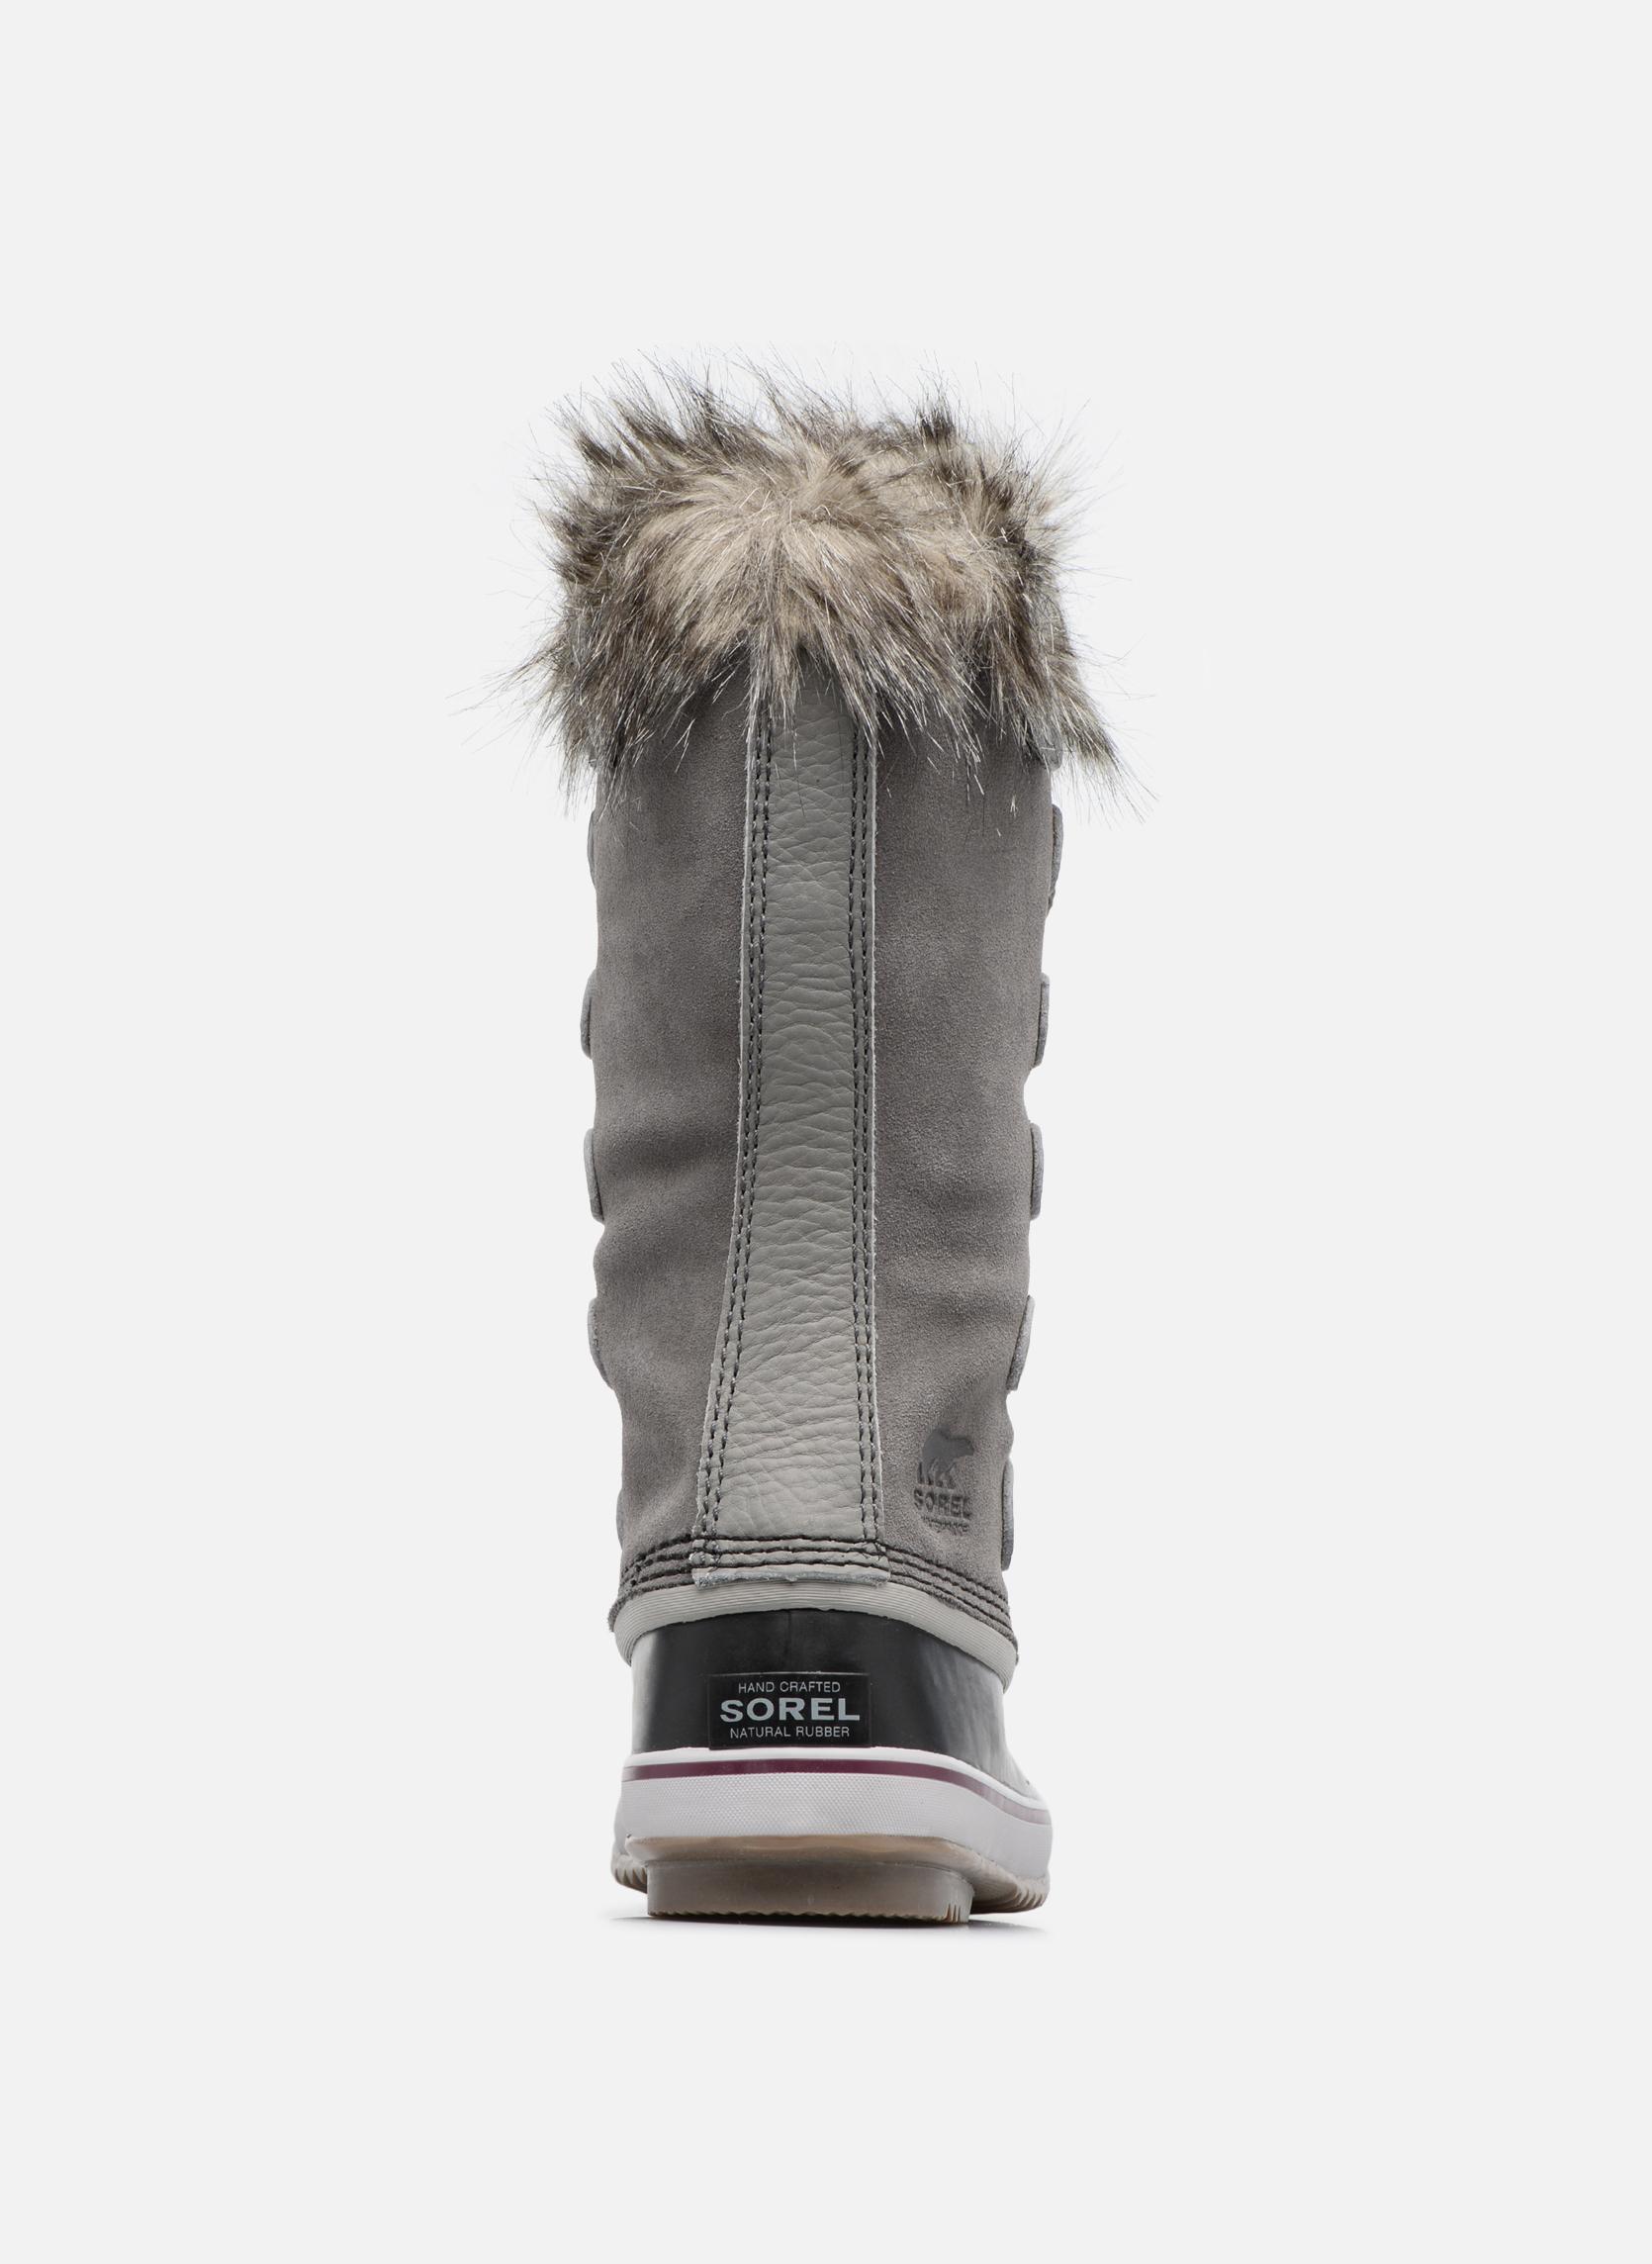 Acheter En Ligne Pas Cher Sorel Joan Of Arctic Grijó Vente Amazon GtitmPIR